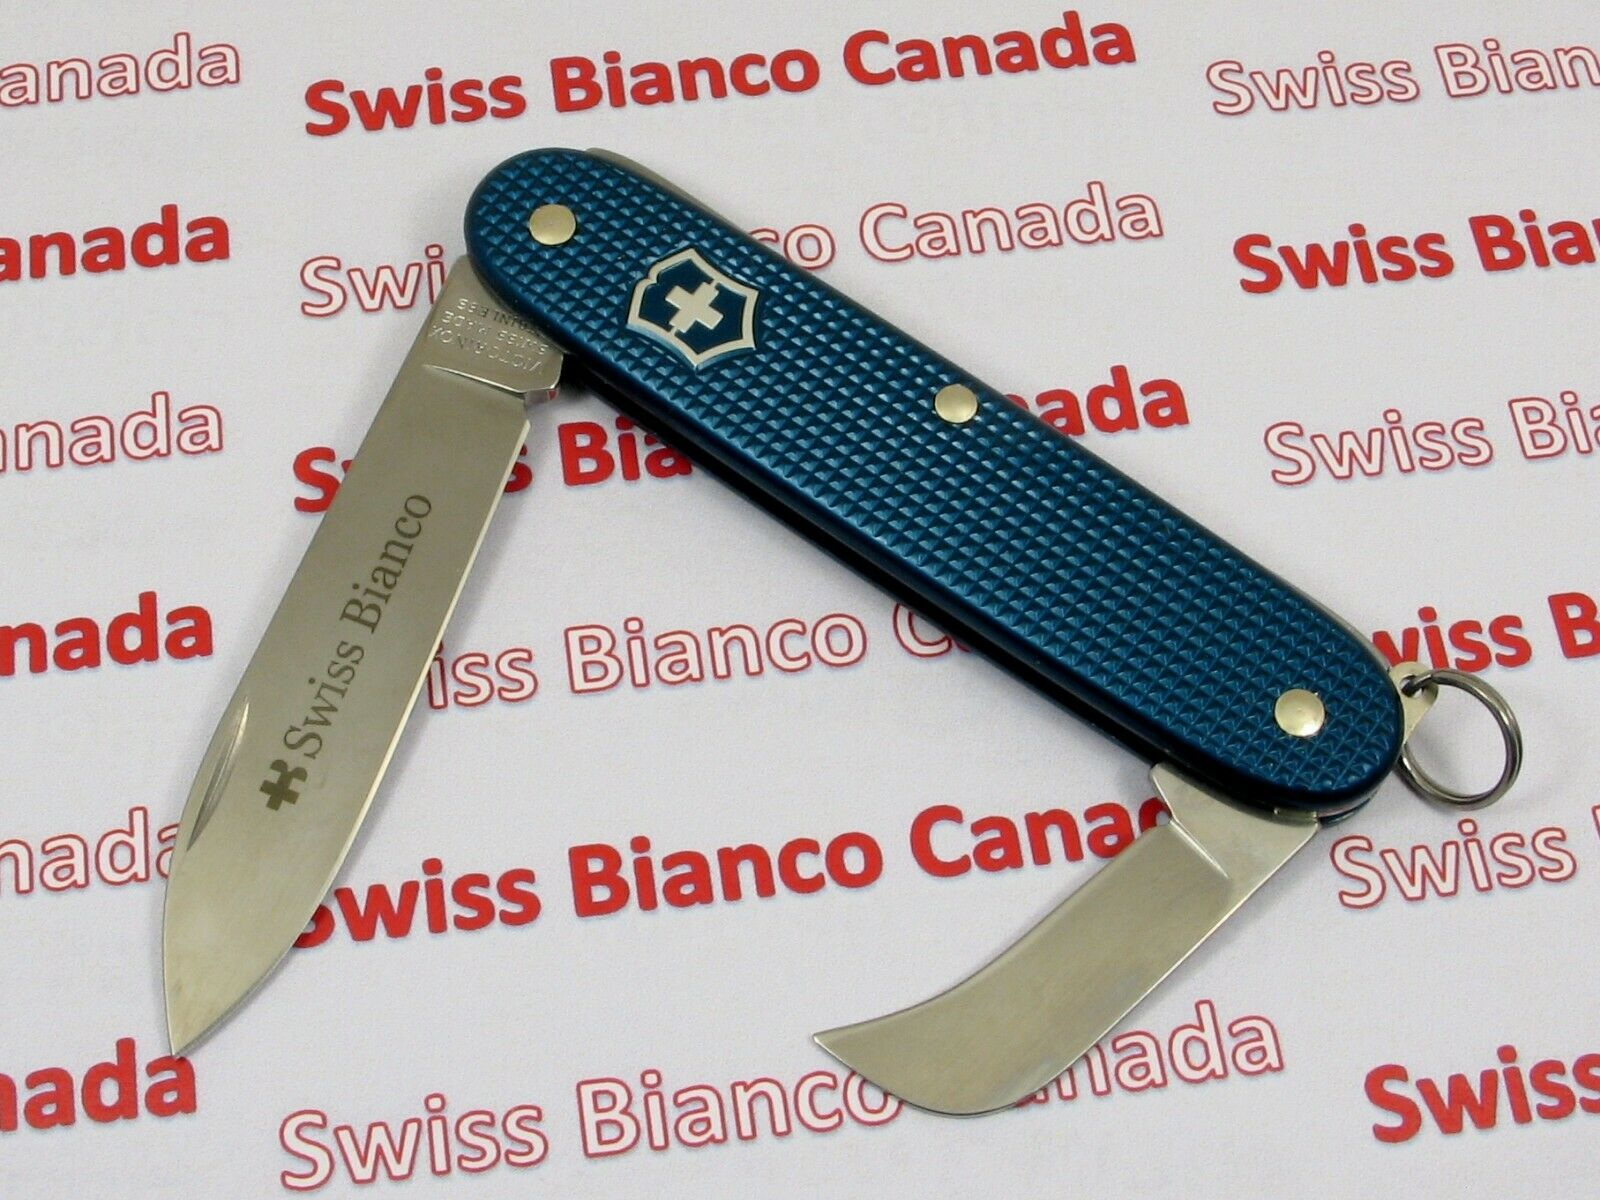 Swiss Bianco Exclusive Victorinox Pruner Teal bluee Alox Swiss Army Knife